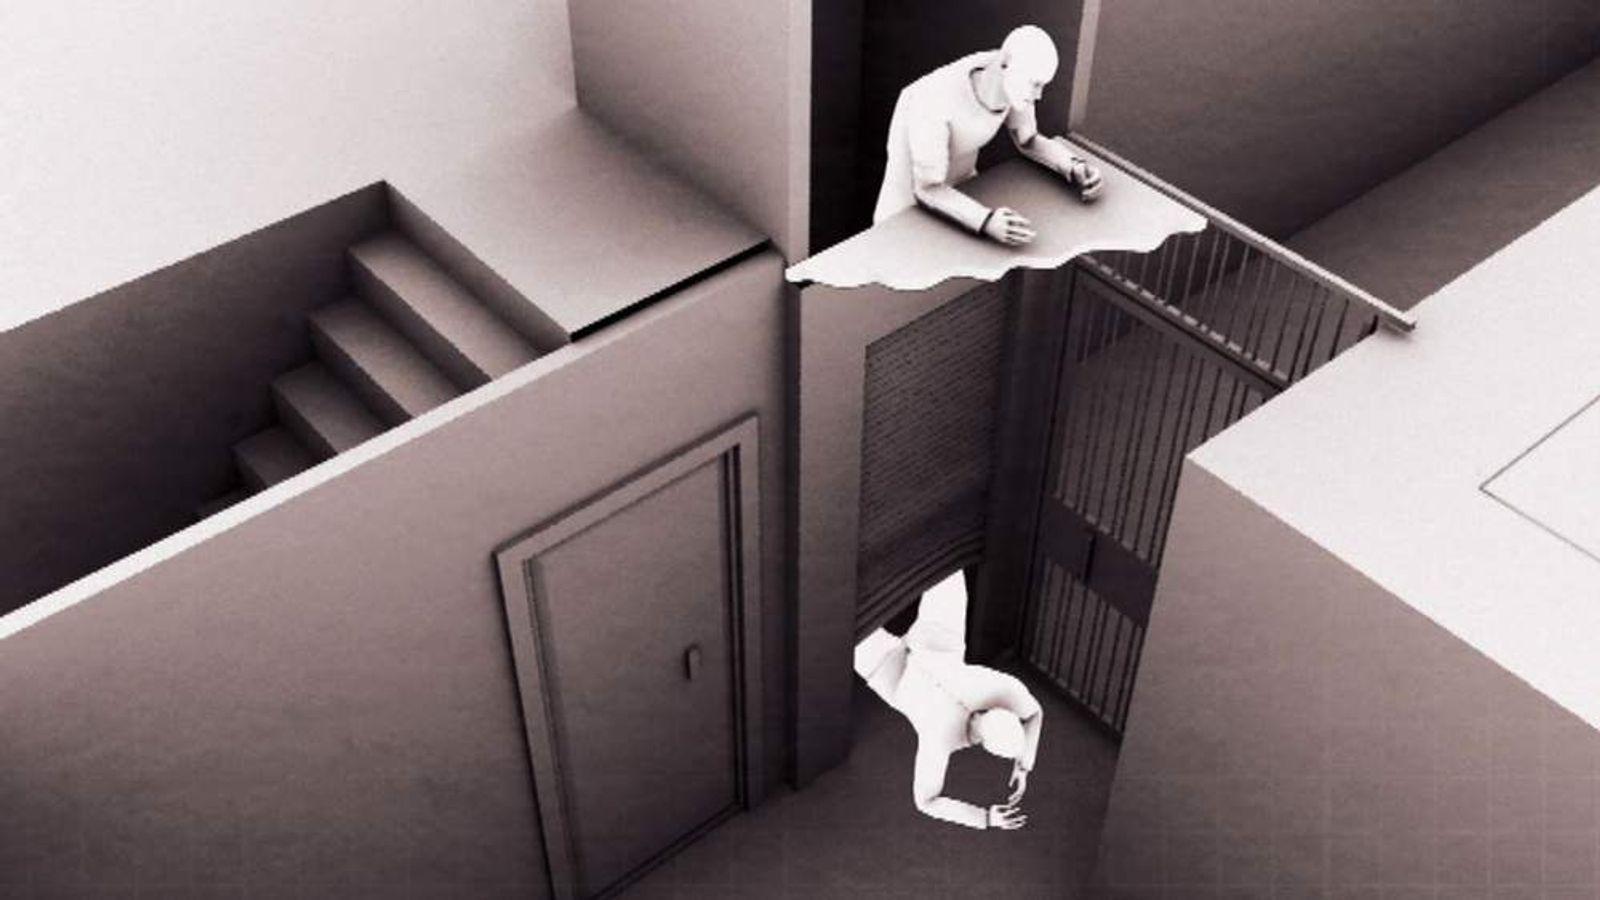 A 3D graphic showing men climbing down an elevator shaft